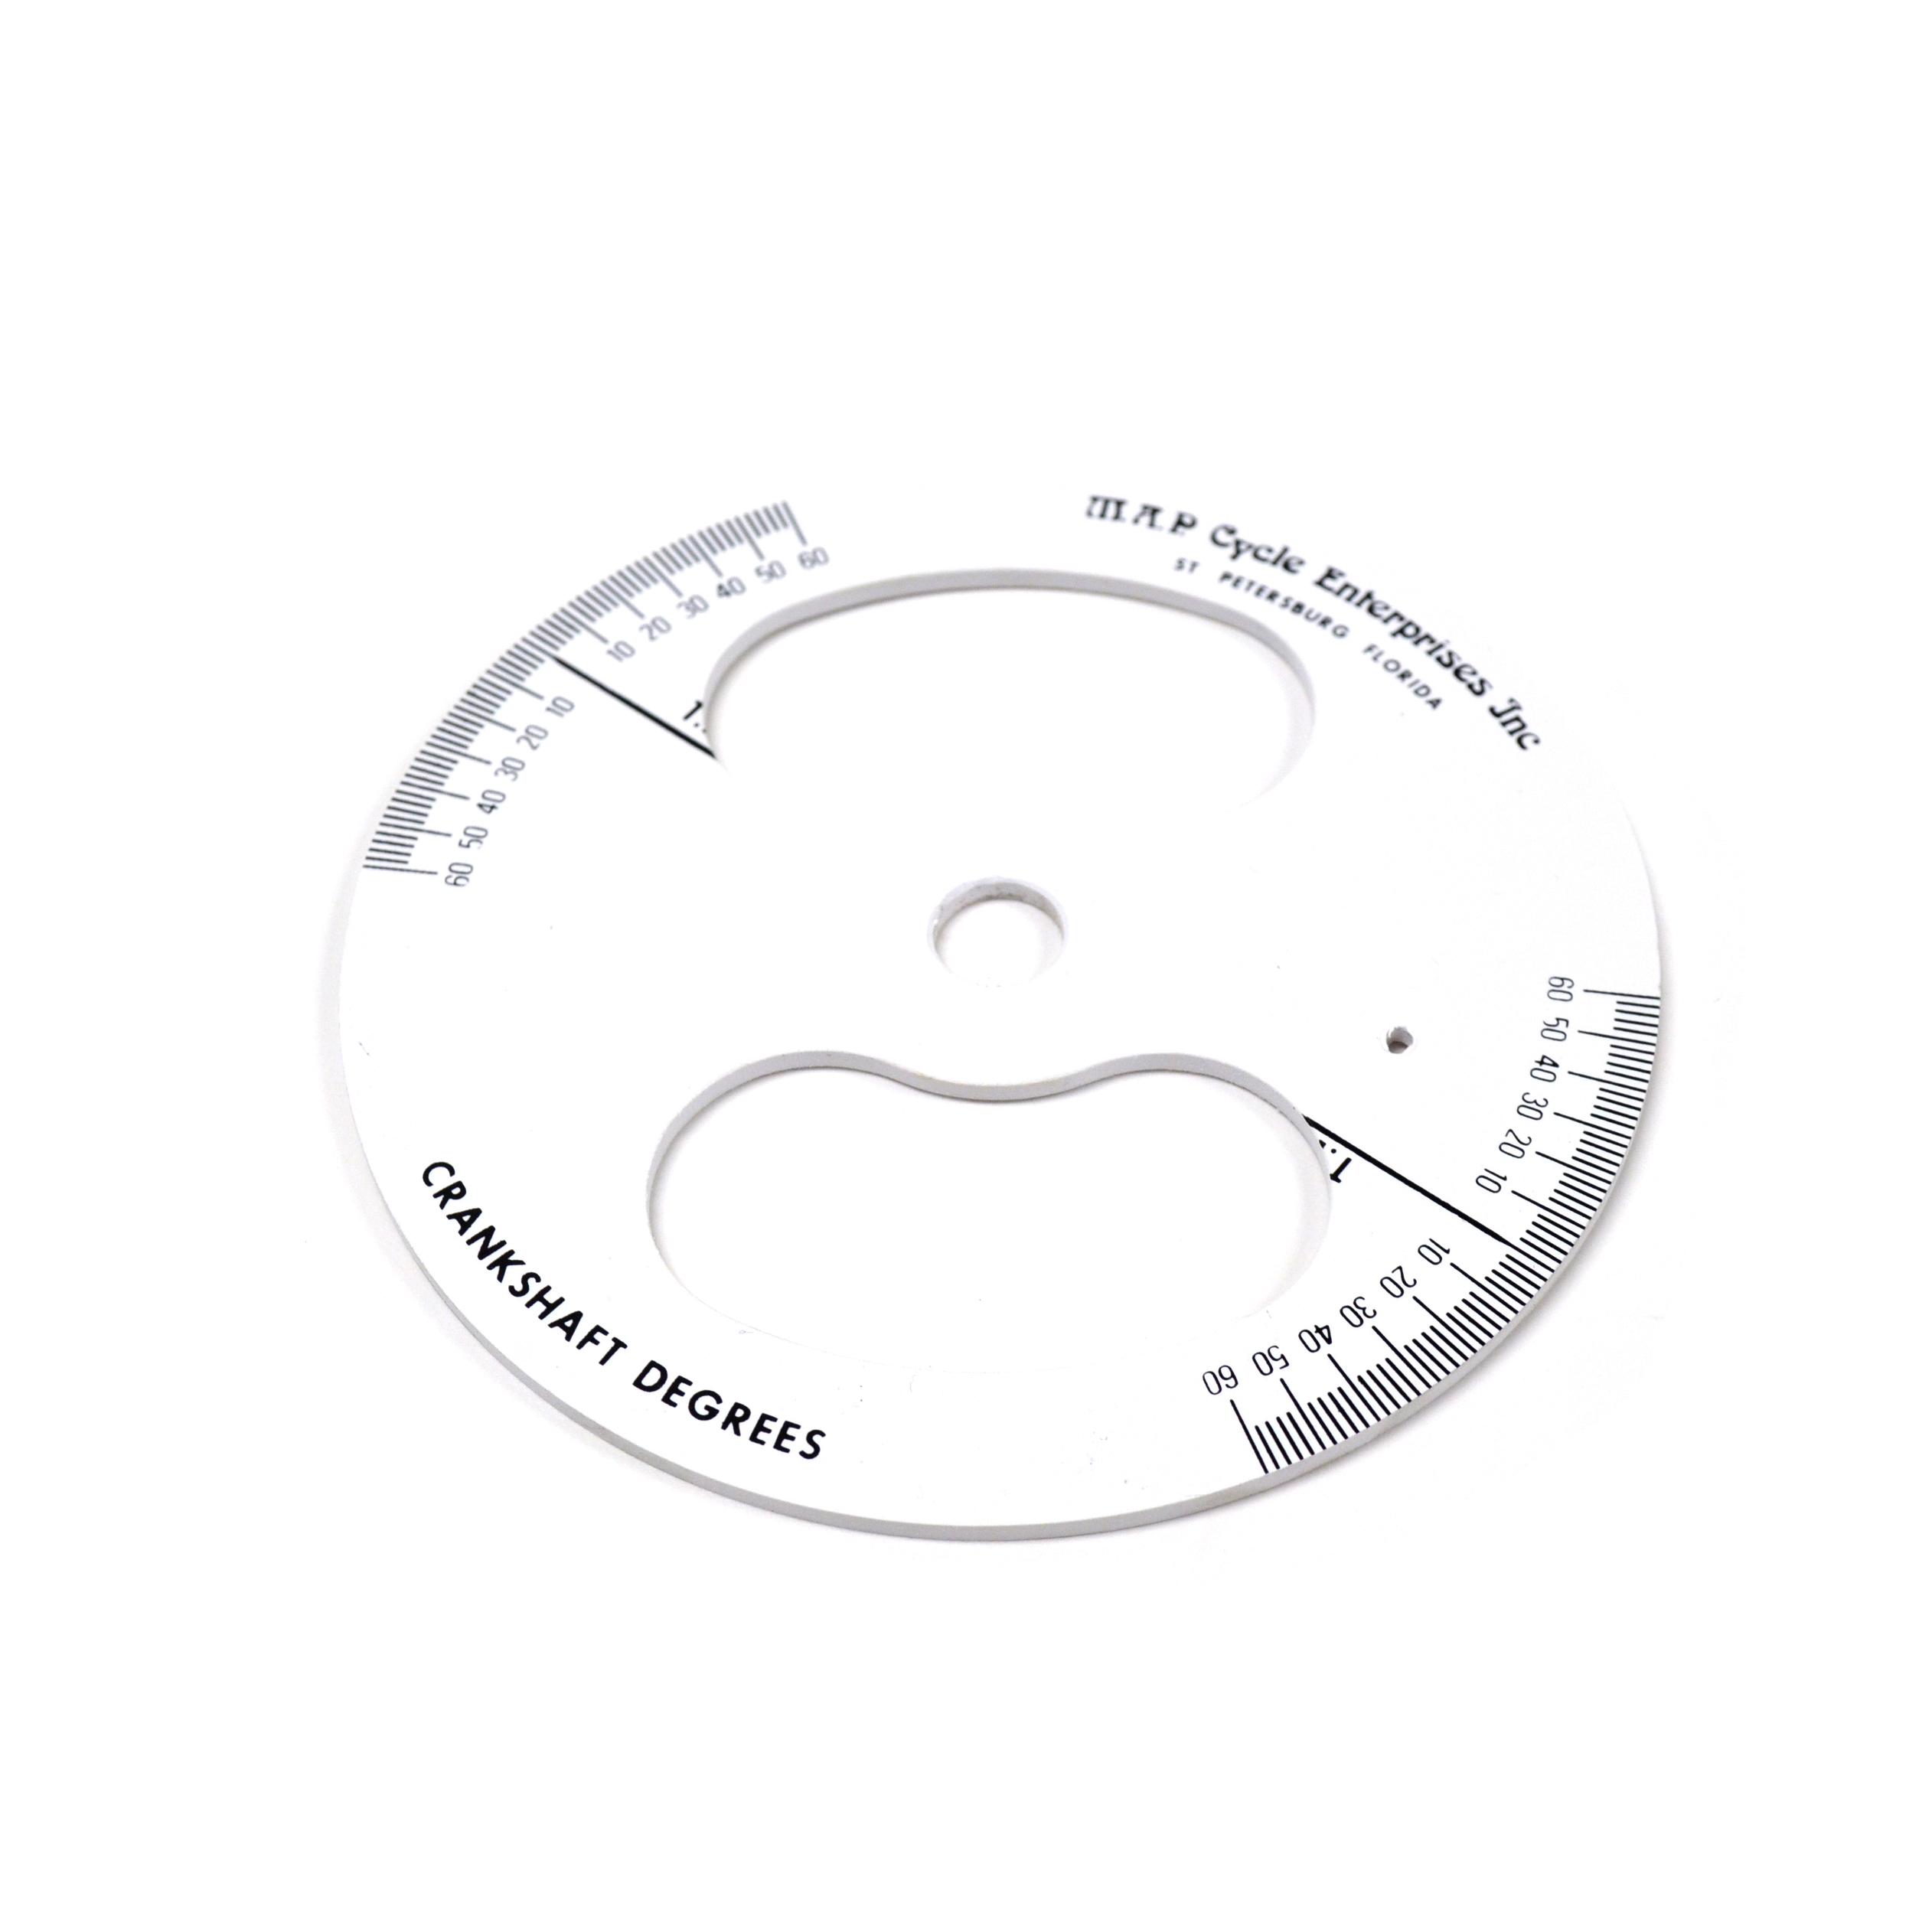 triumph bsa norton degree wheel timing kit map0850